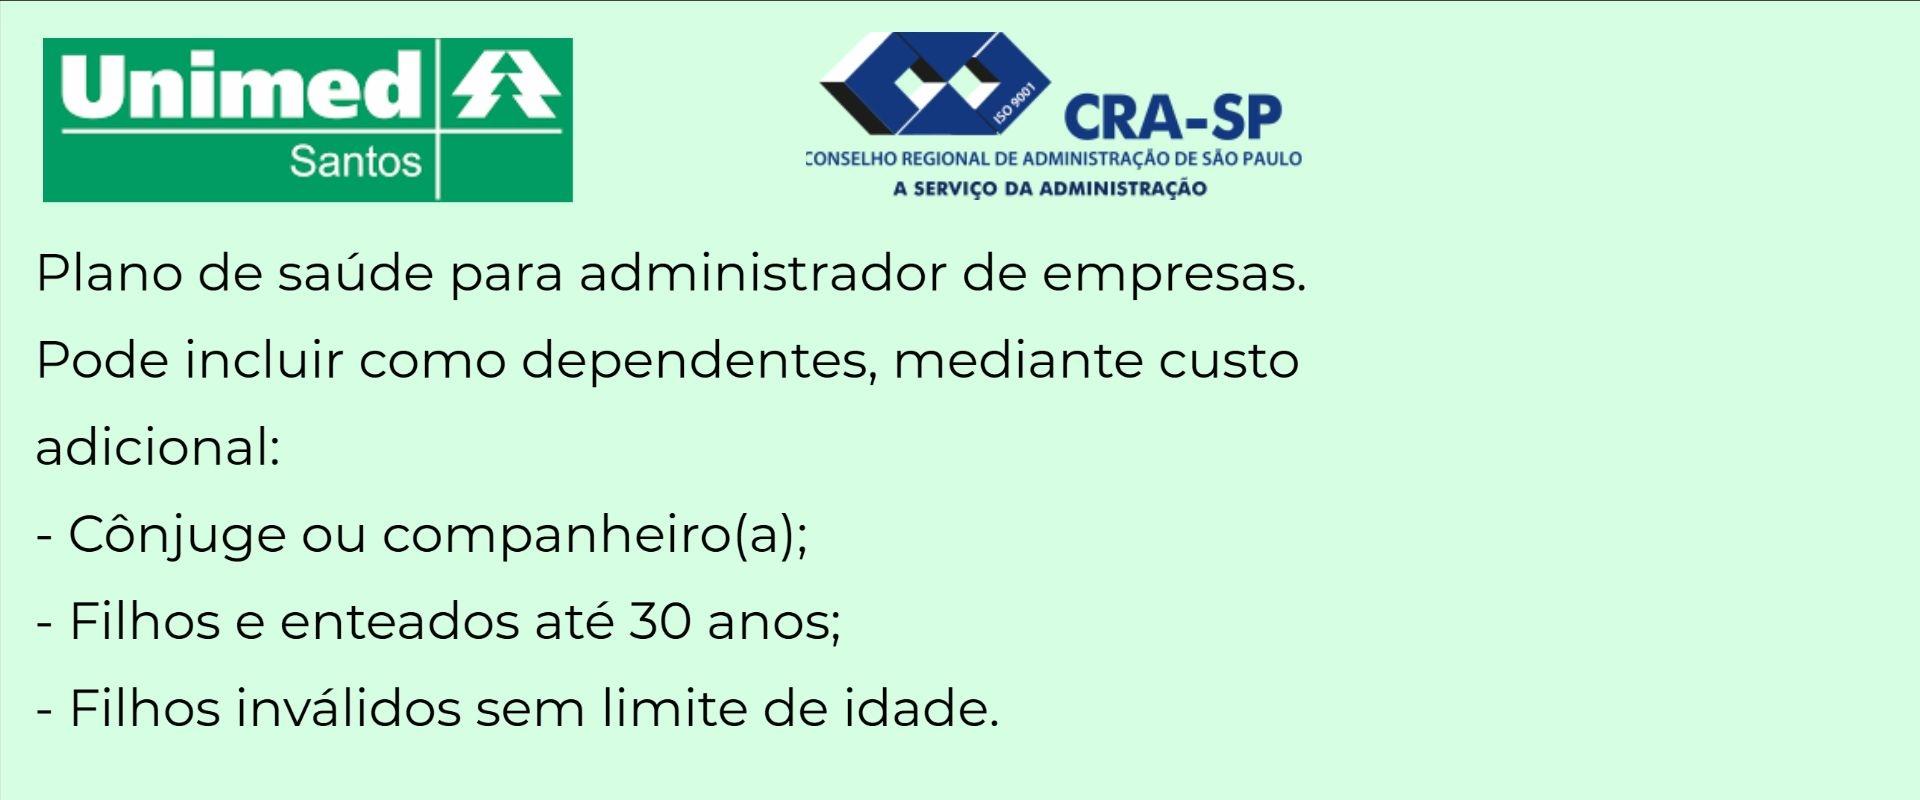 Unimed Santos CRA-SP